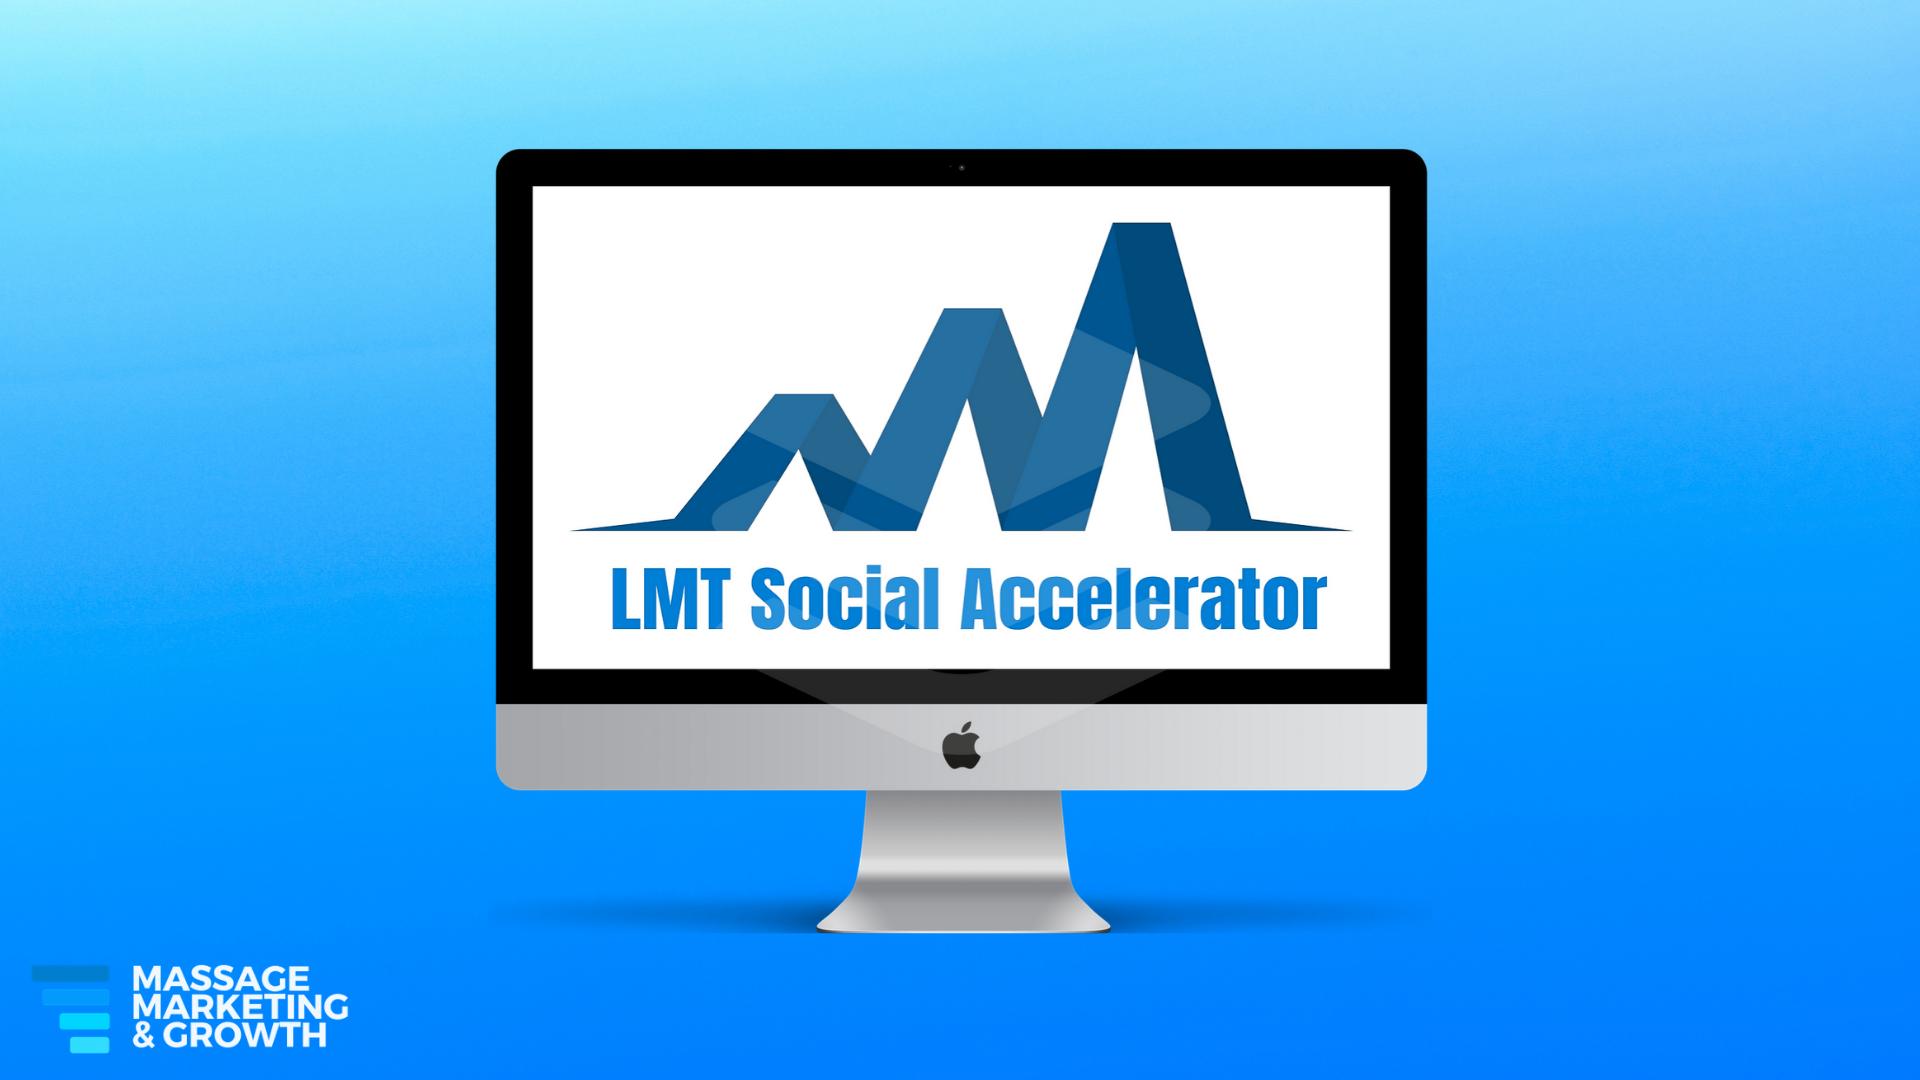 LMT Social Accelerator